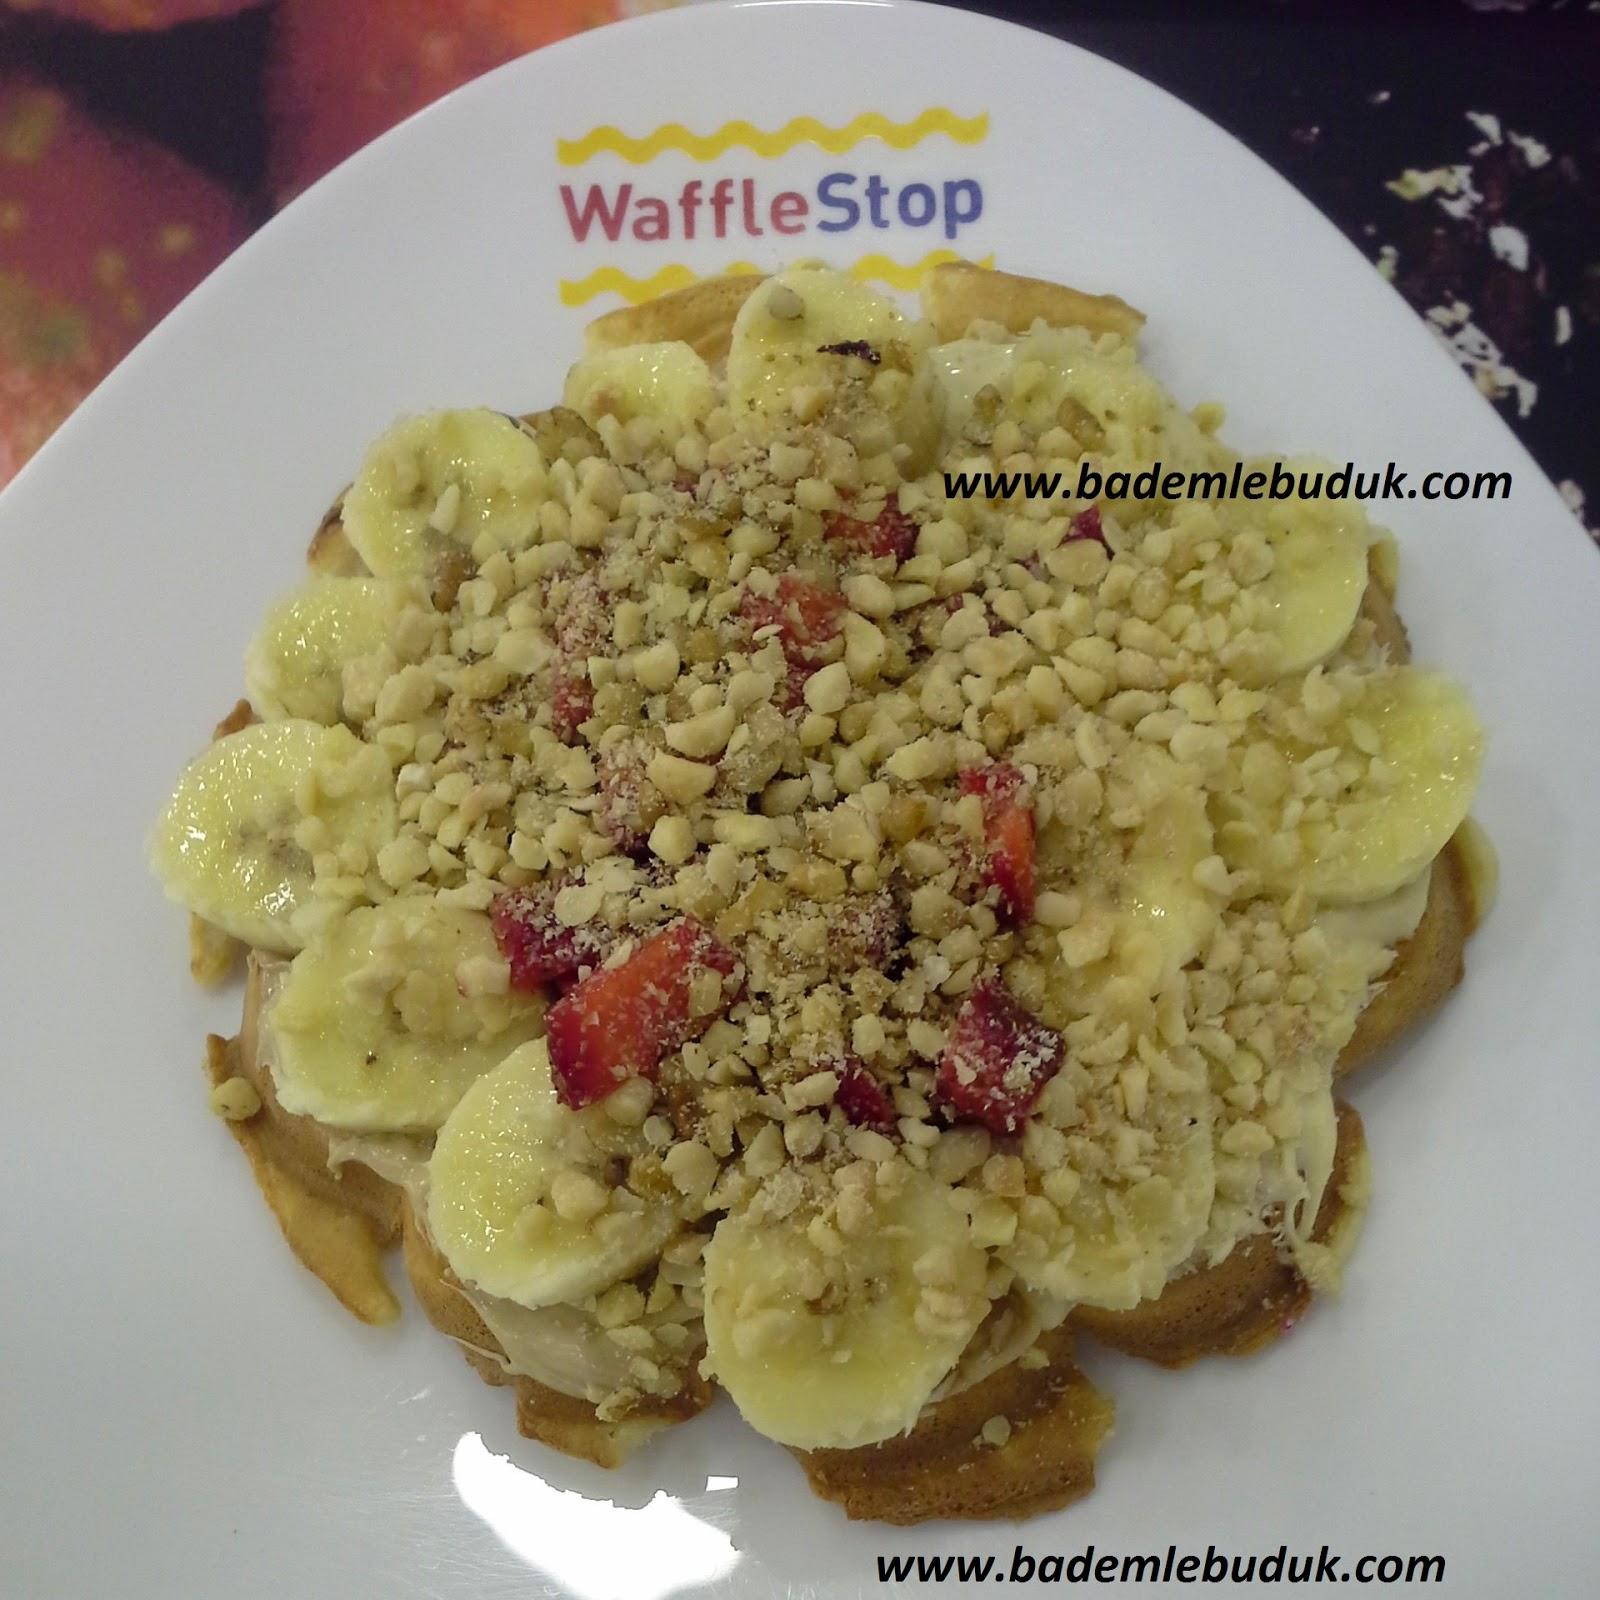 lezzetli waffle